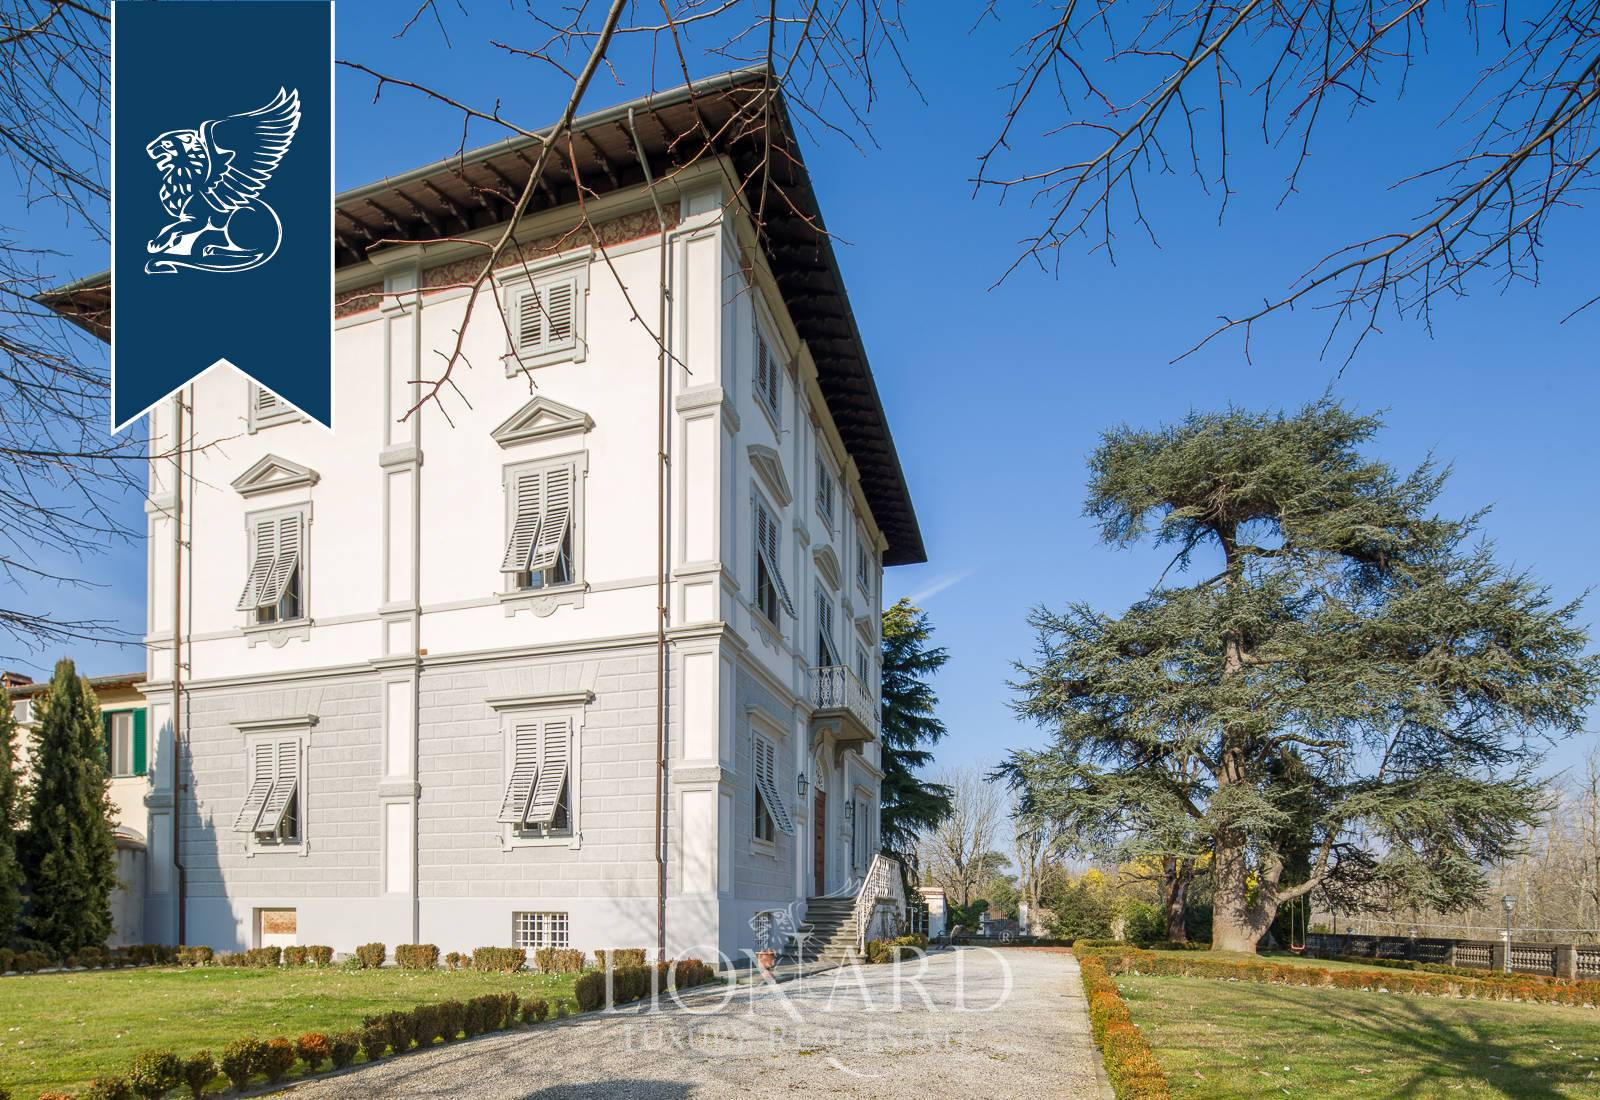 Villa in Vendita a Lucca: 0 locali, 770 mq - Foto 8